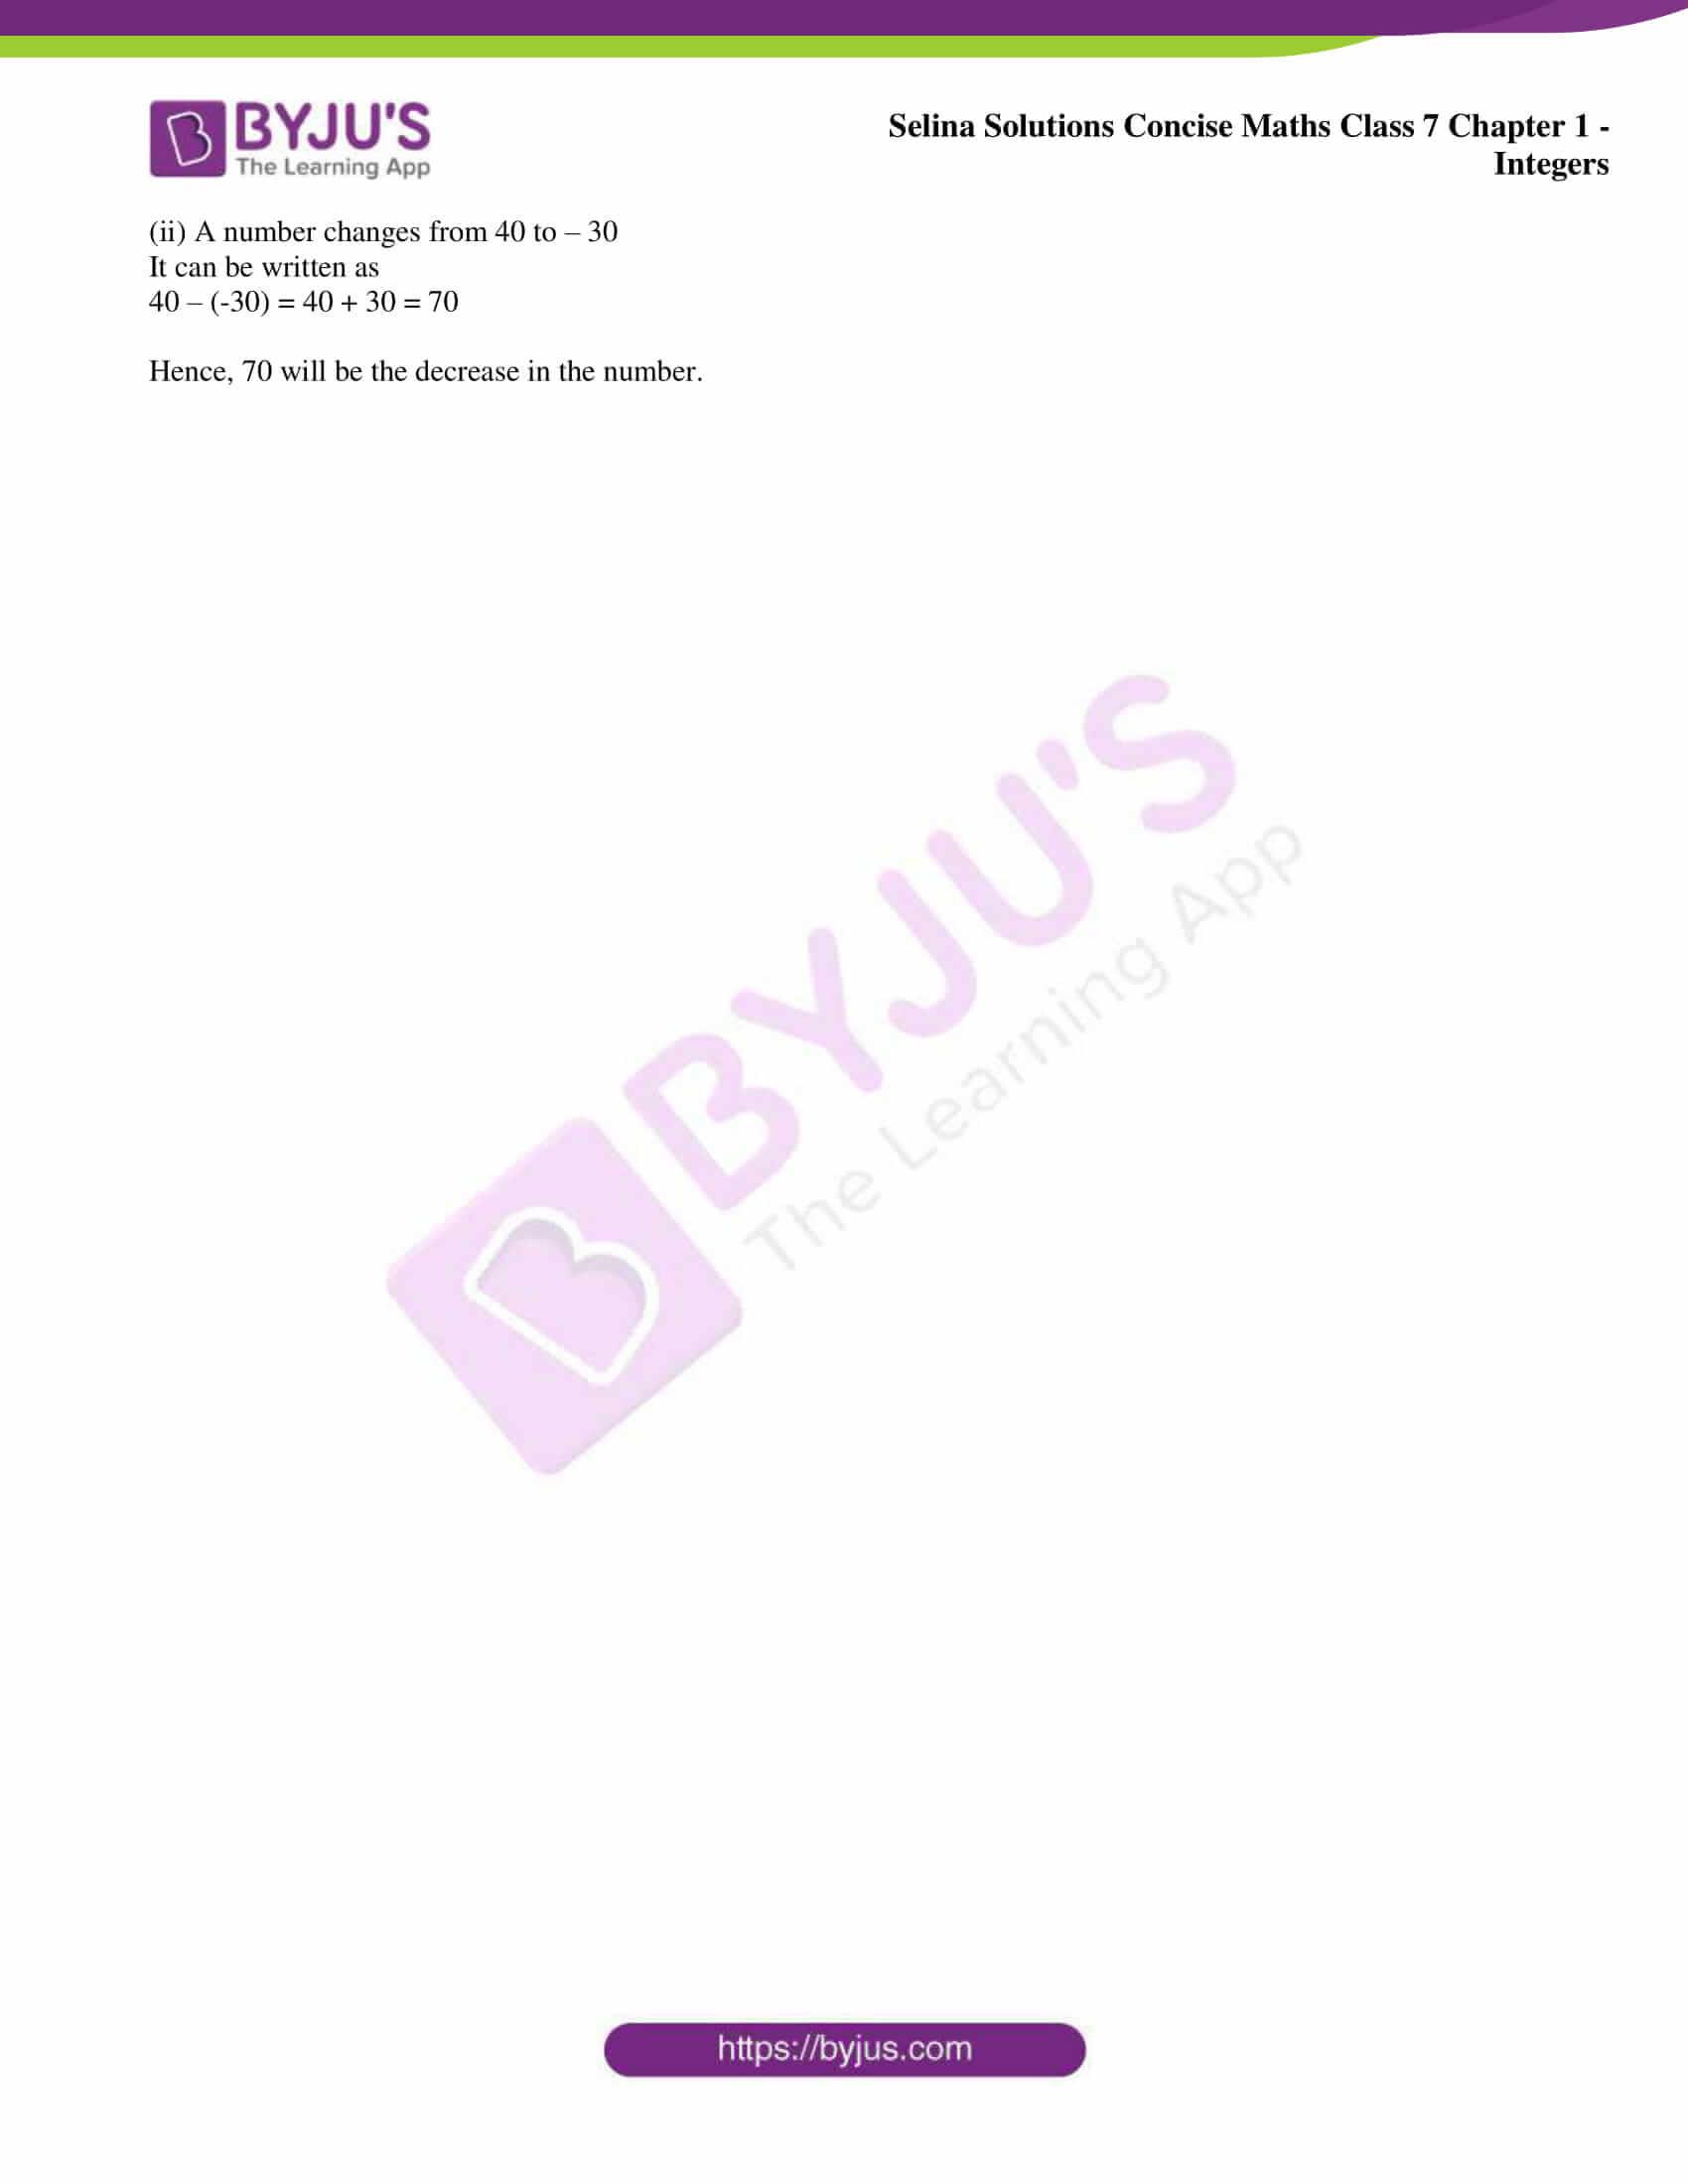 selina sol concise maths class 7 ch1 ex 1d 6